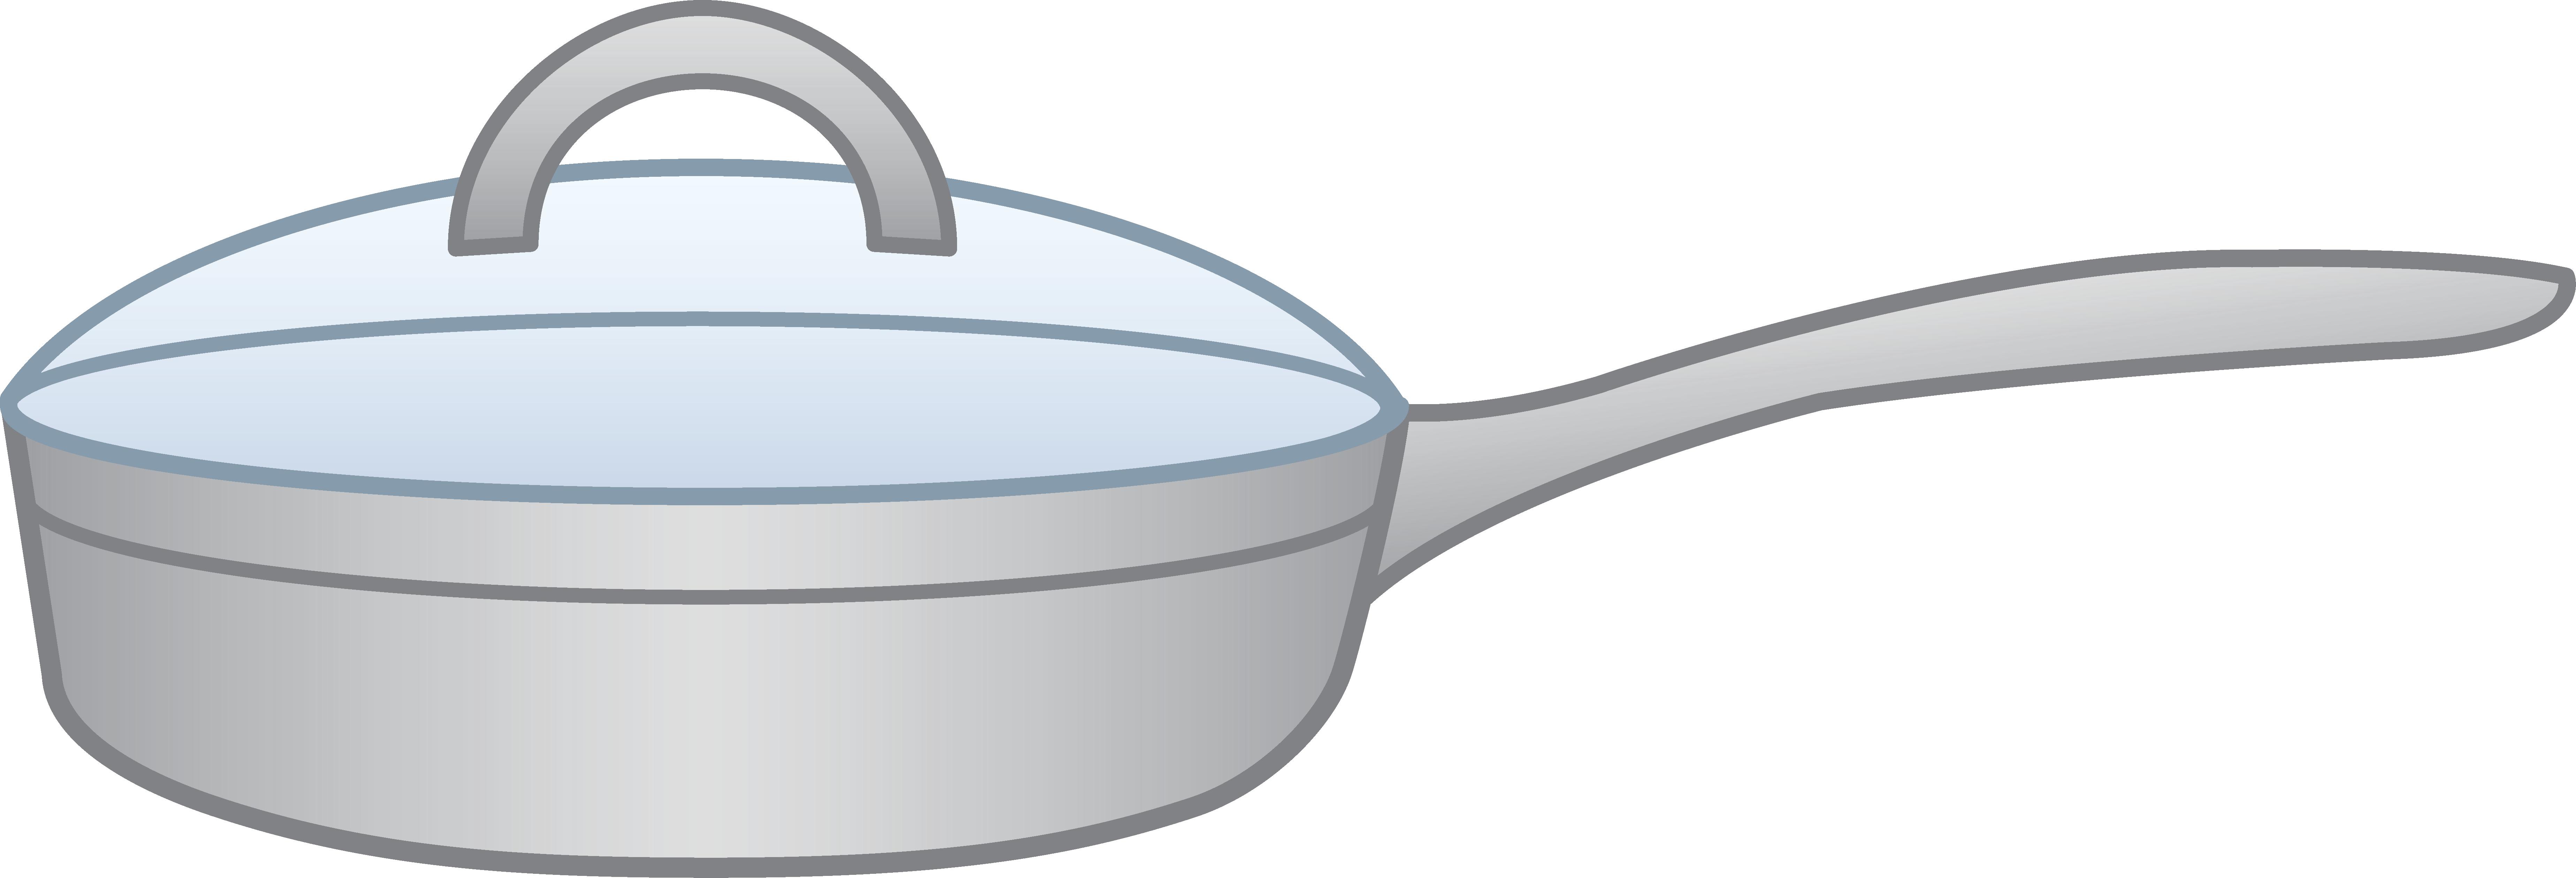 Saucepan clipart - Clipground